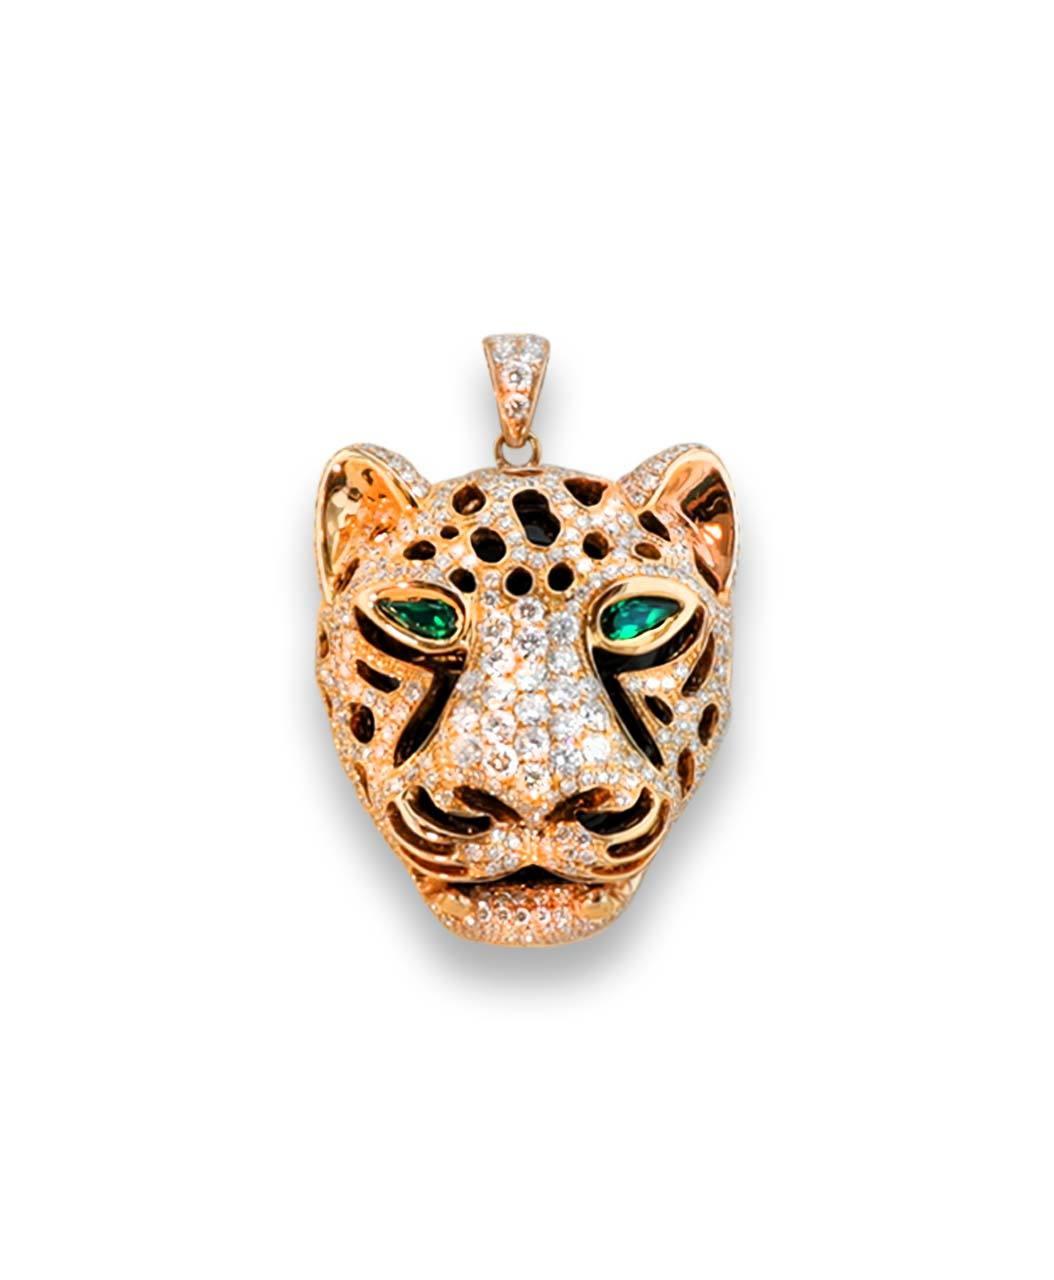 Maverick's Rose Gold Leopard Face Diamond Pendant With Emerald Eyes